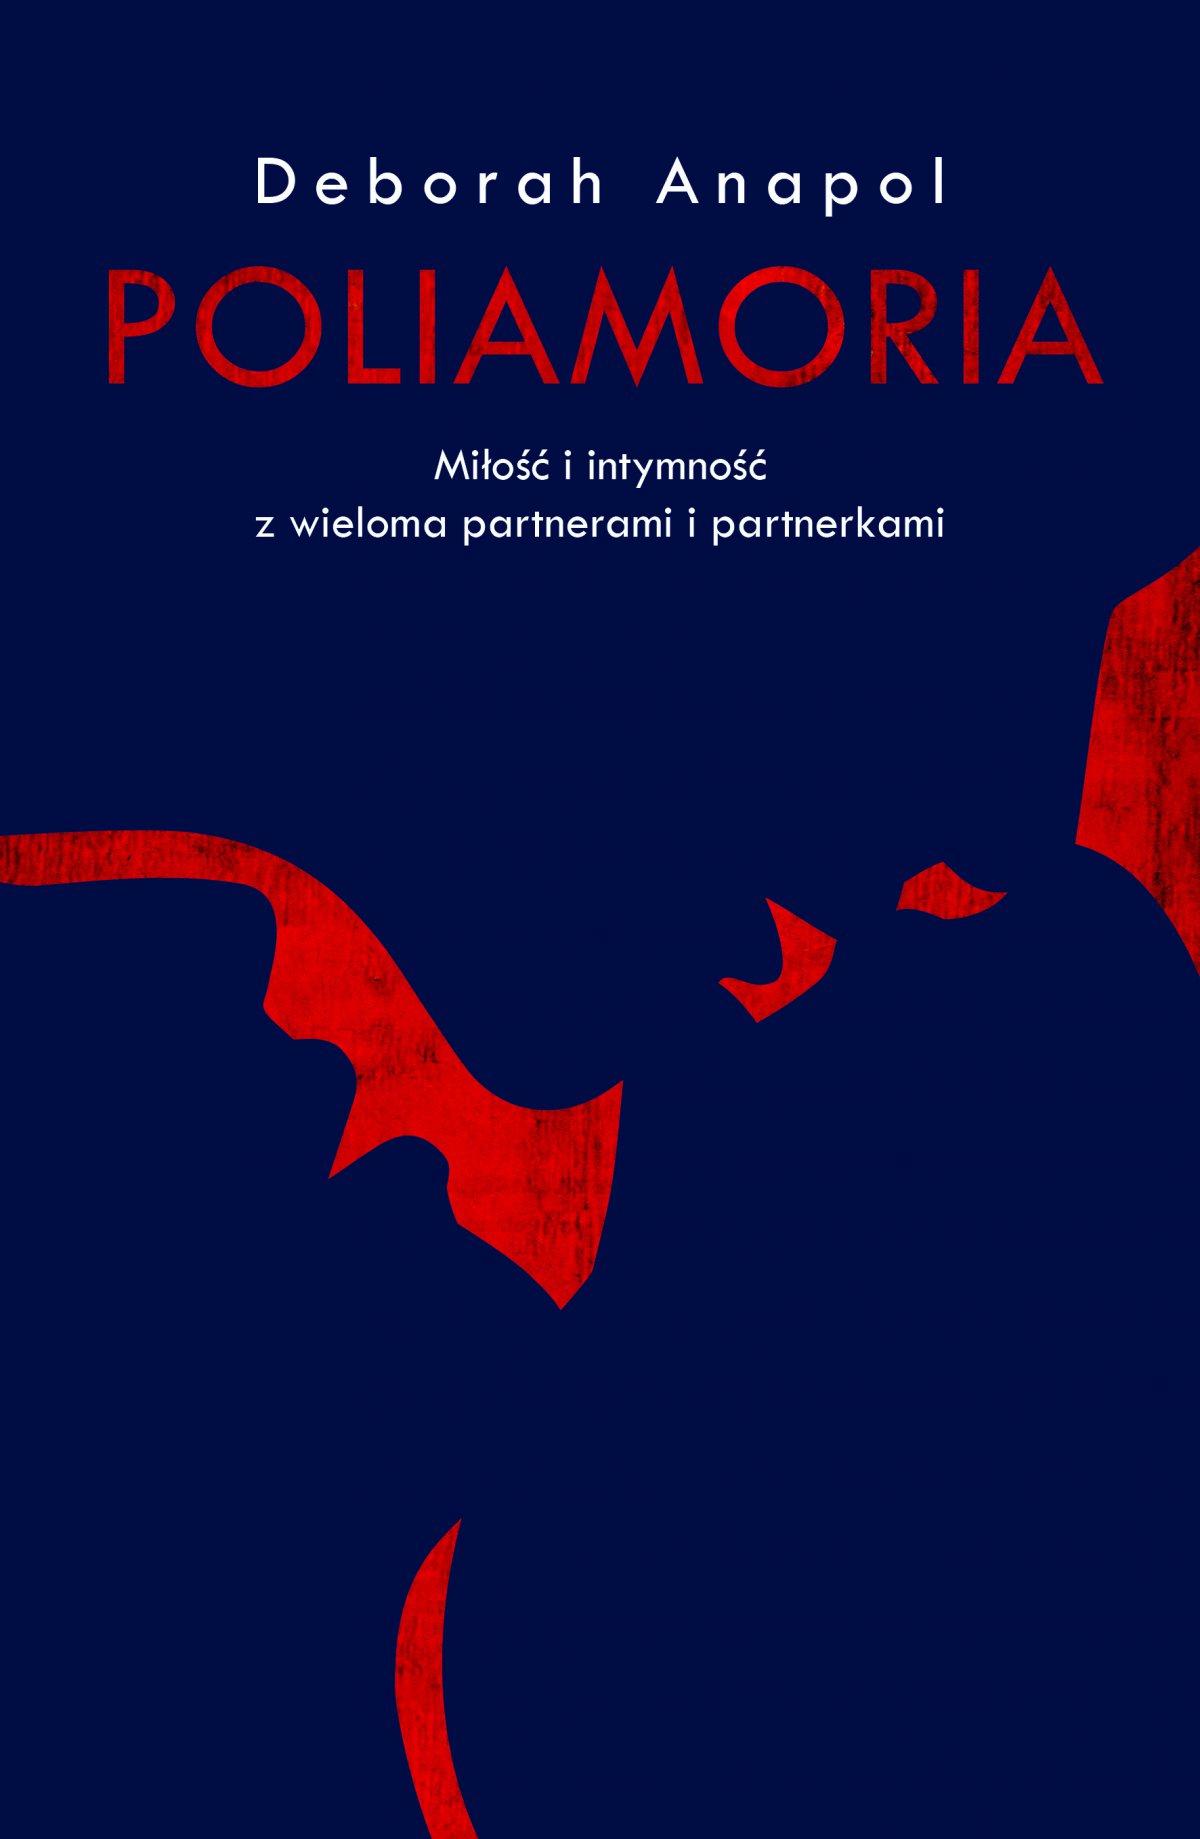 Poliamoria - Ebook (Książka EPUB) do pobrania w formacie EPUB